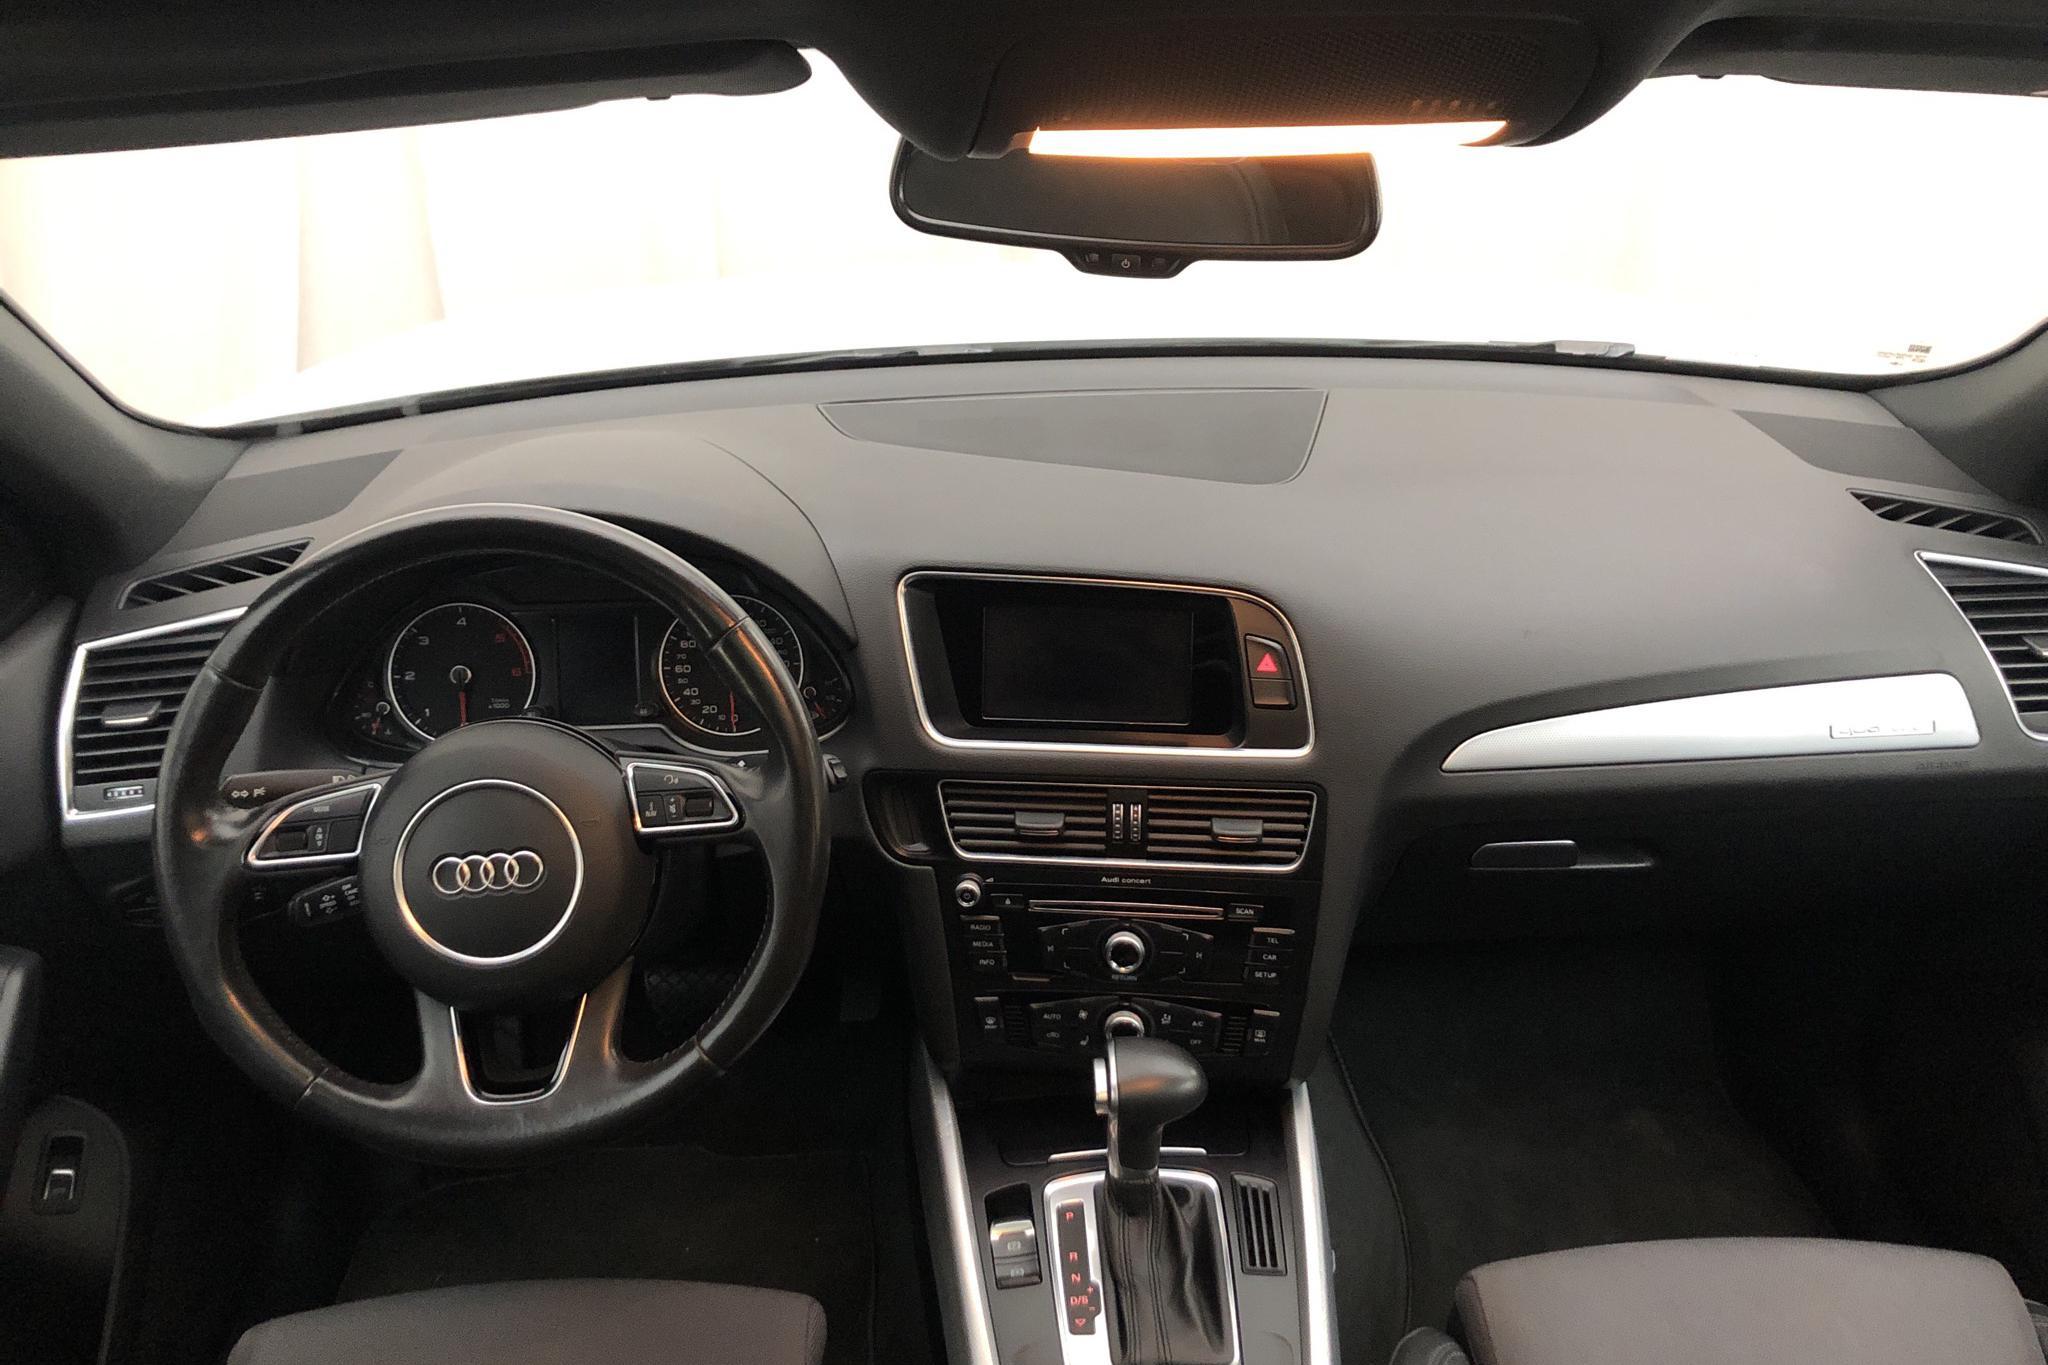 Audi Q5 2.0 TDI clean diesel quattro (190hk) - 82 610 km - Automatic - white - 2016